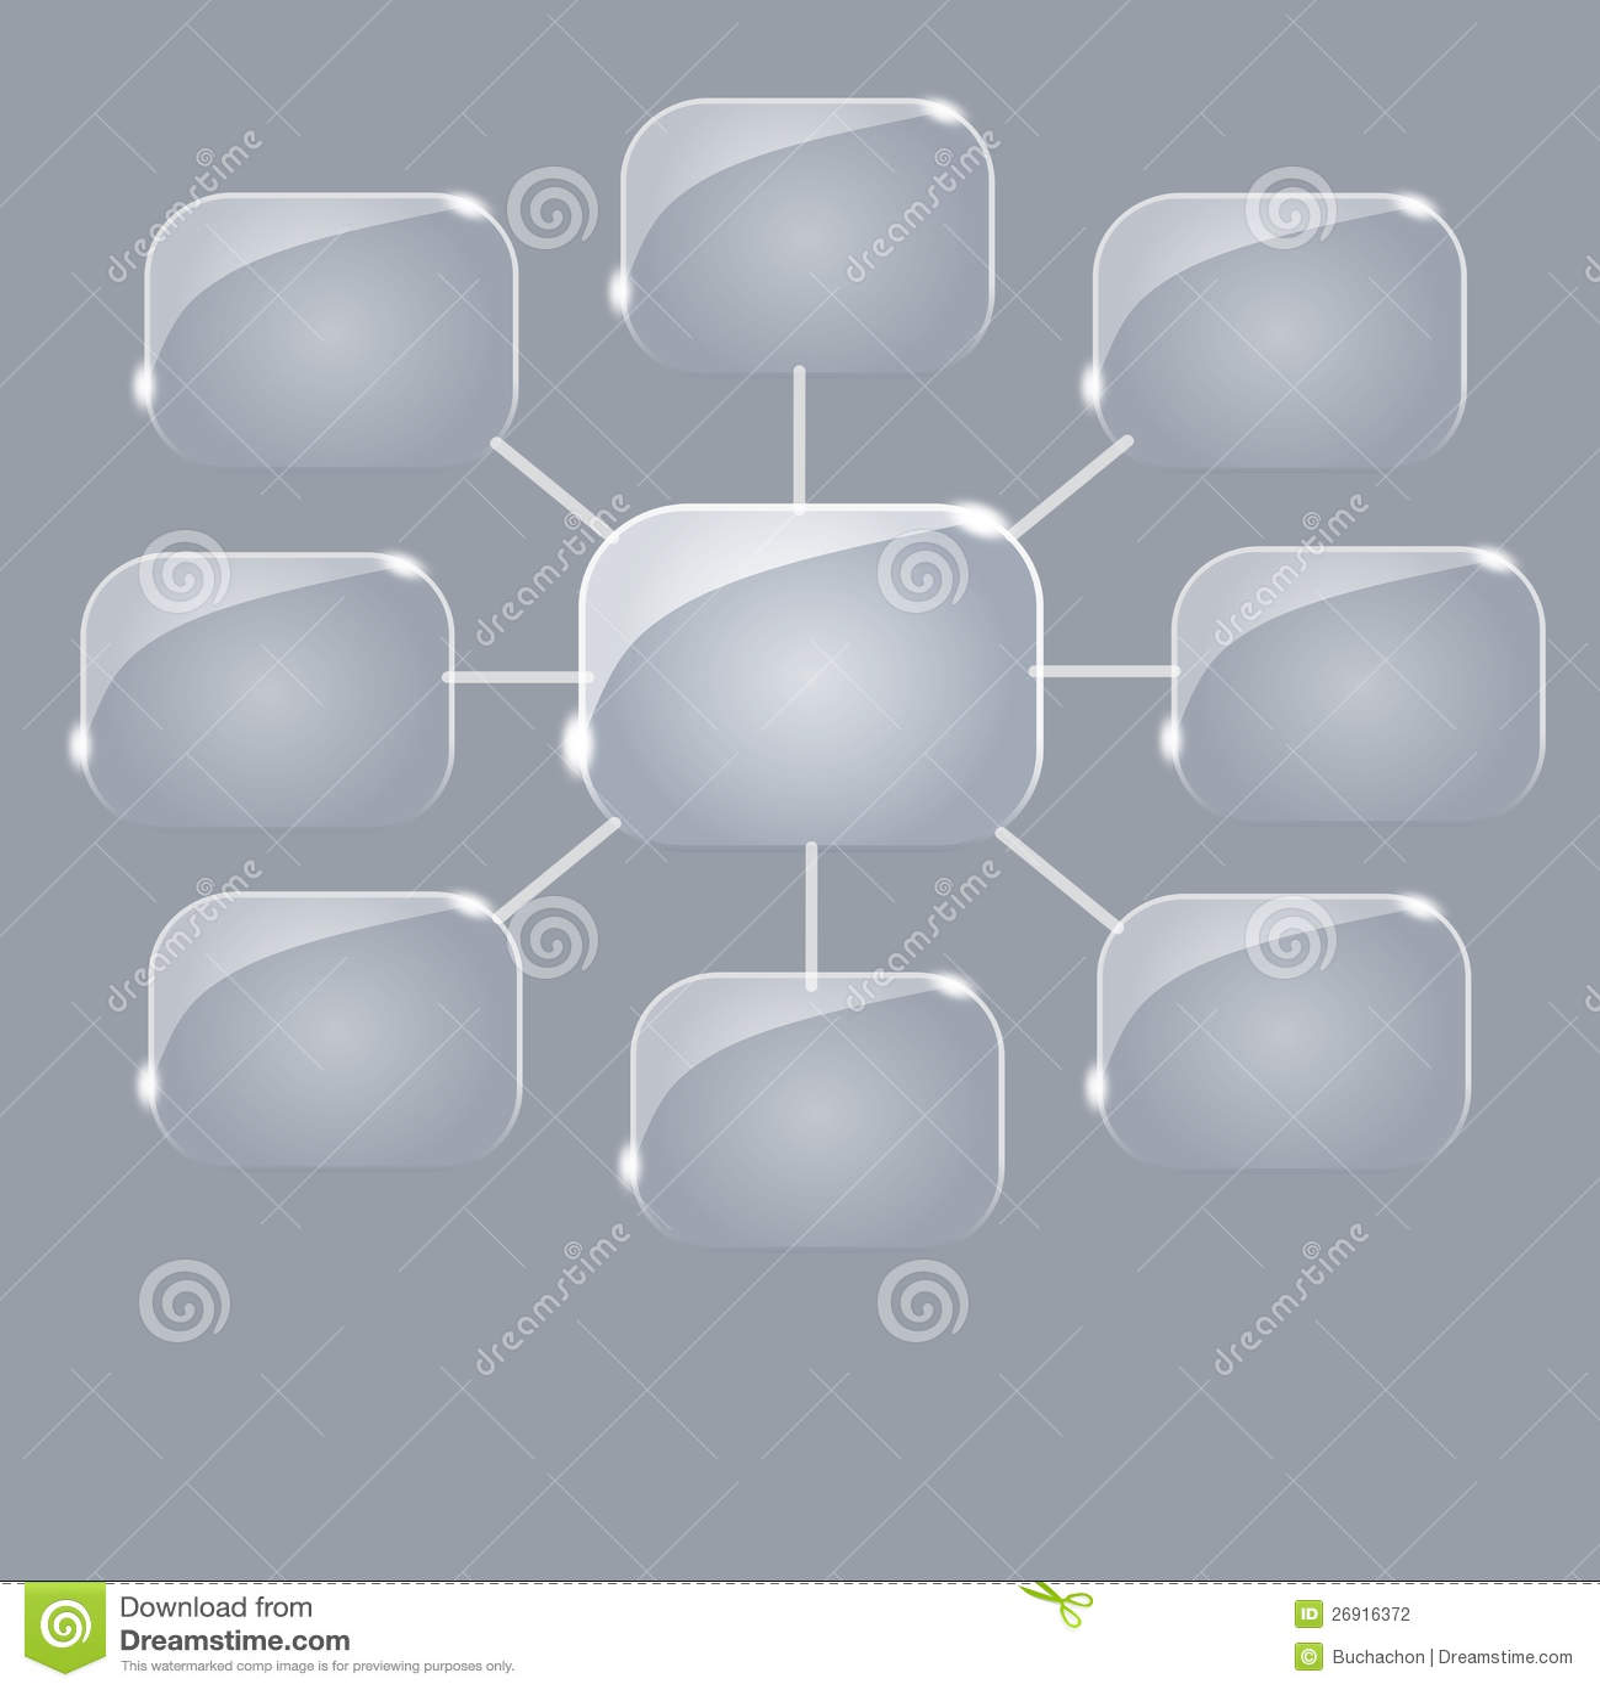 Empty flow chart diagram stock illustration illustration of empty empty flow chart diagram nvjuhfo Gallery